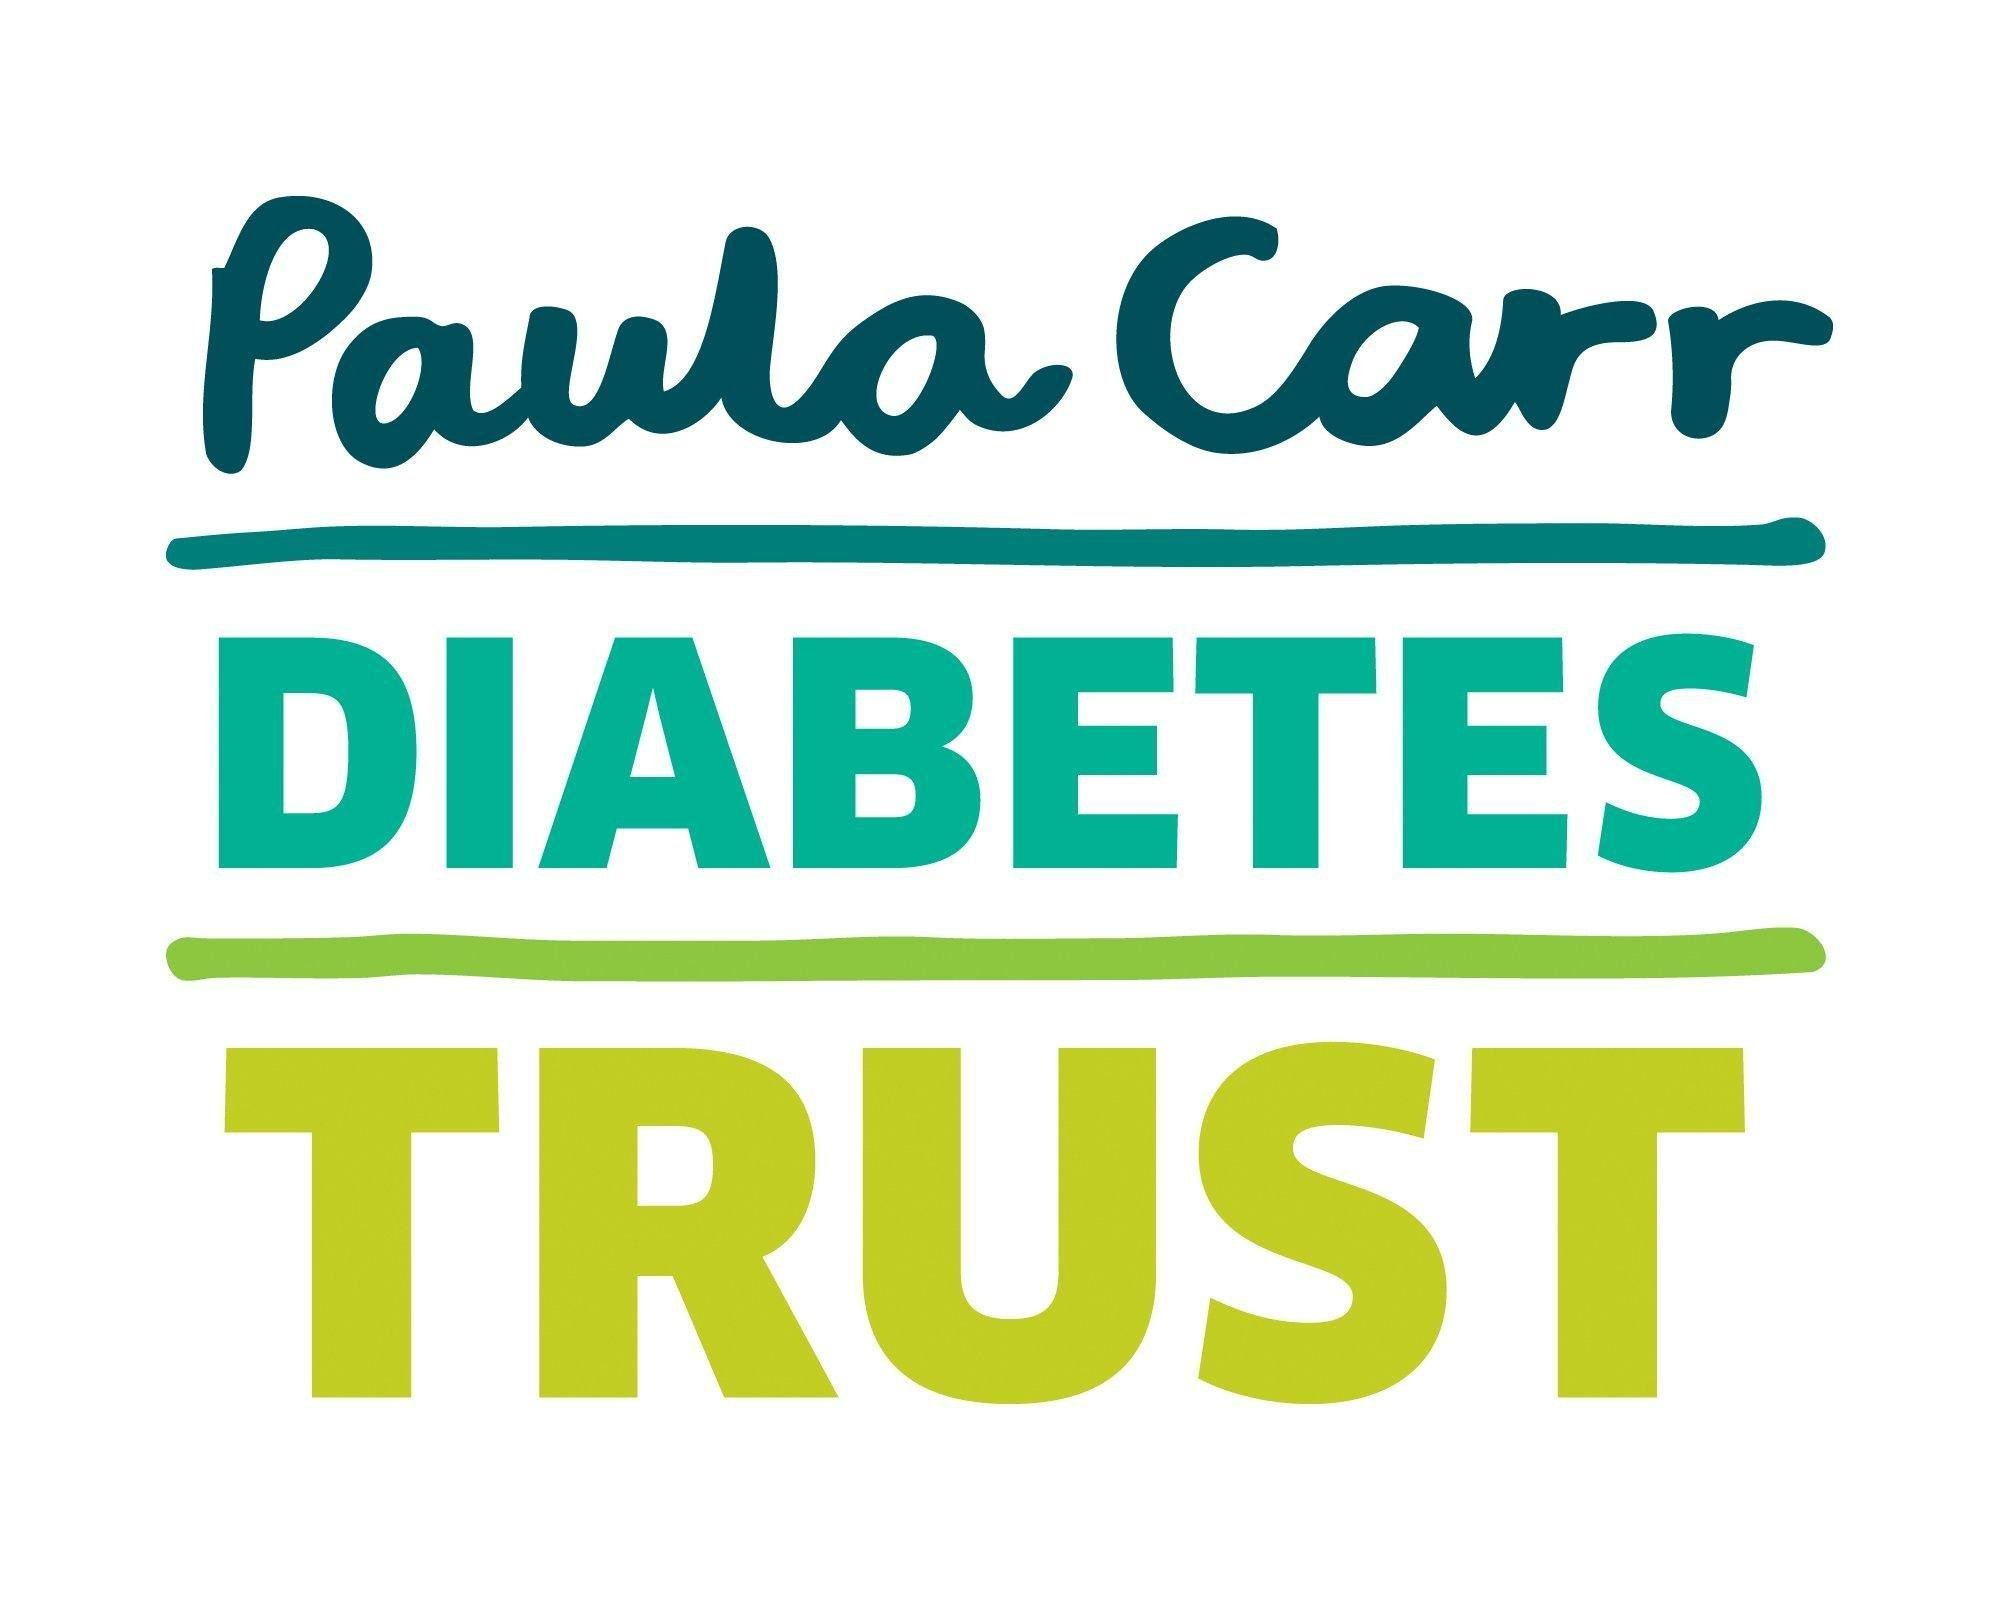 Need Help? - The Paula Carr Diabetes Trust